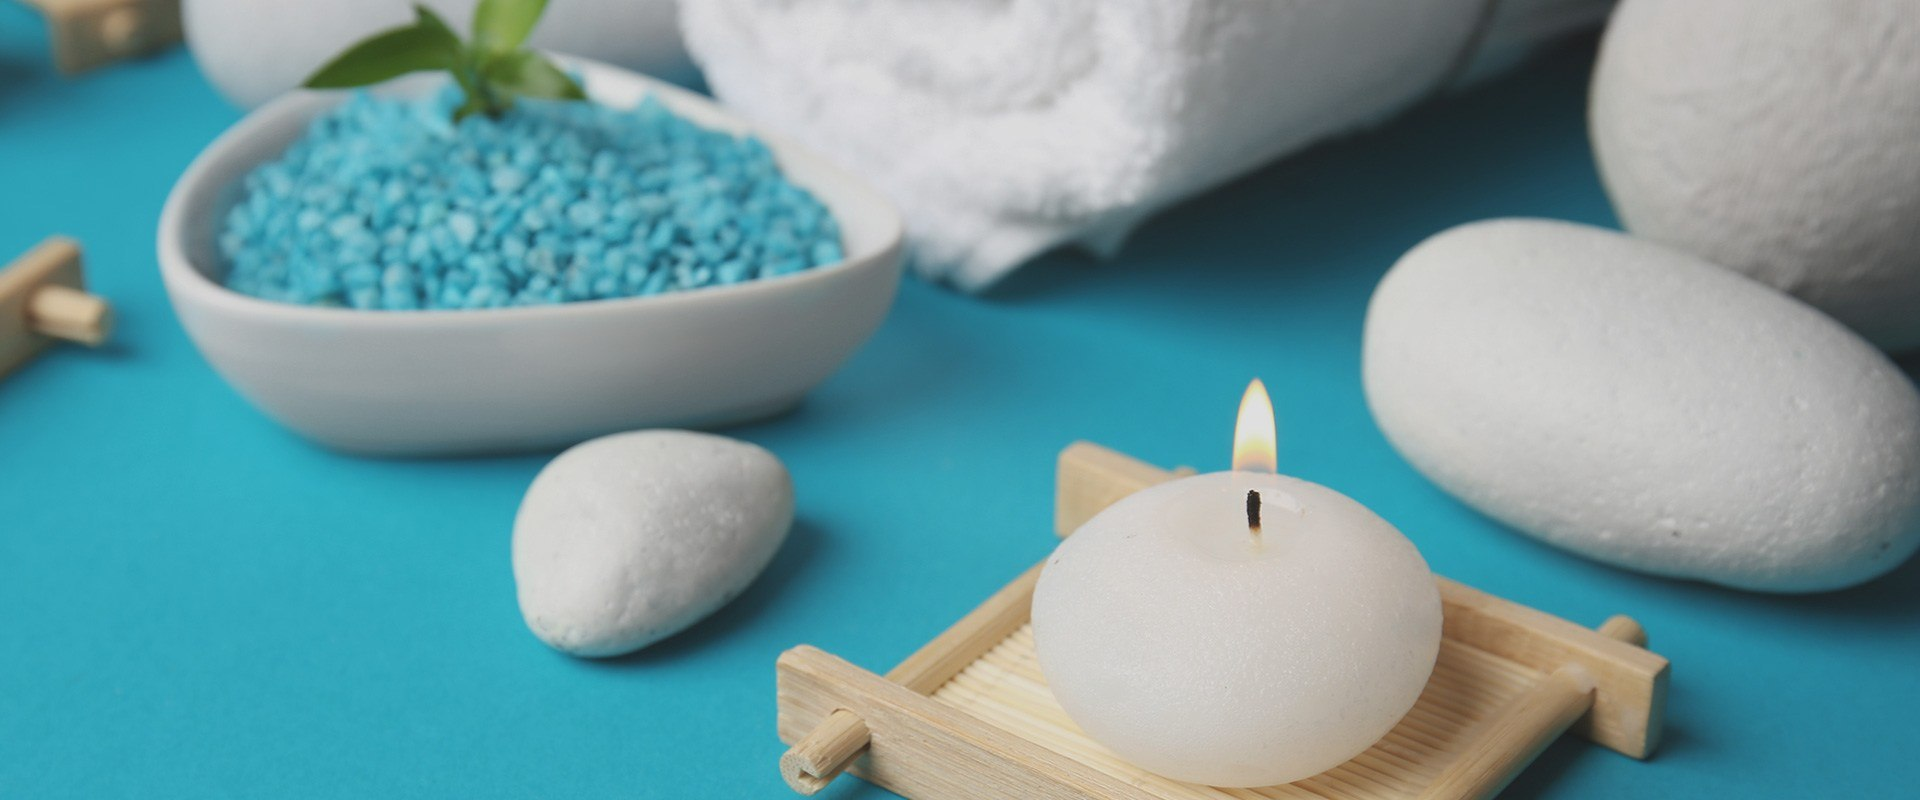 $50 Relaxation Massage